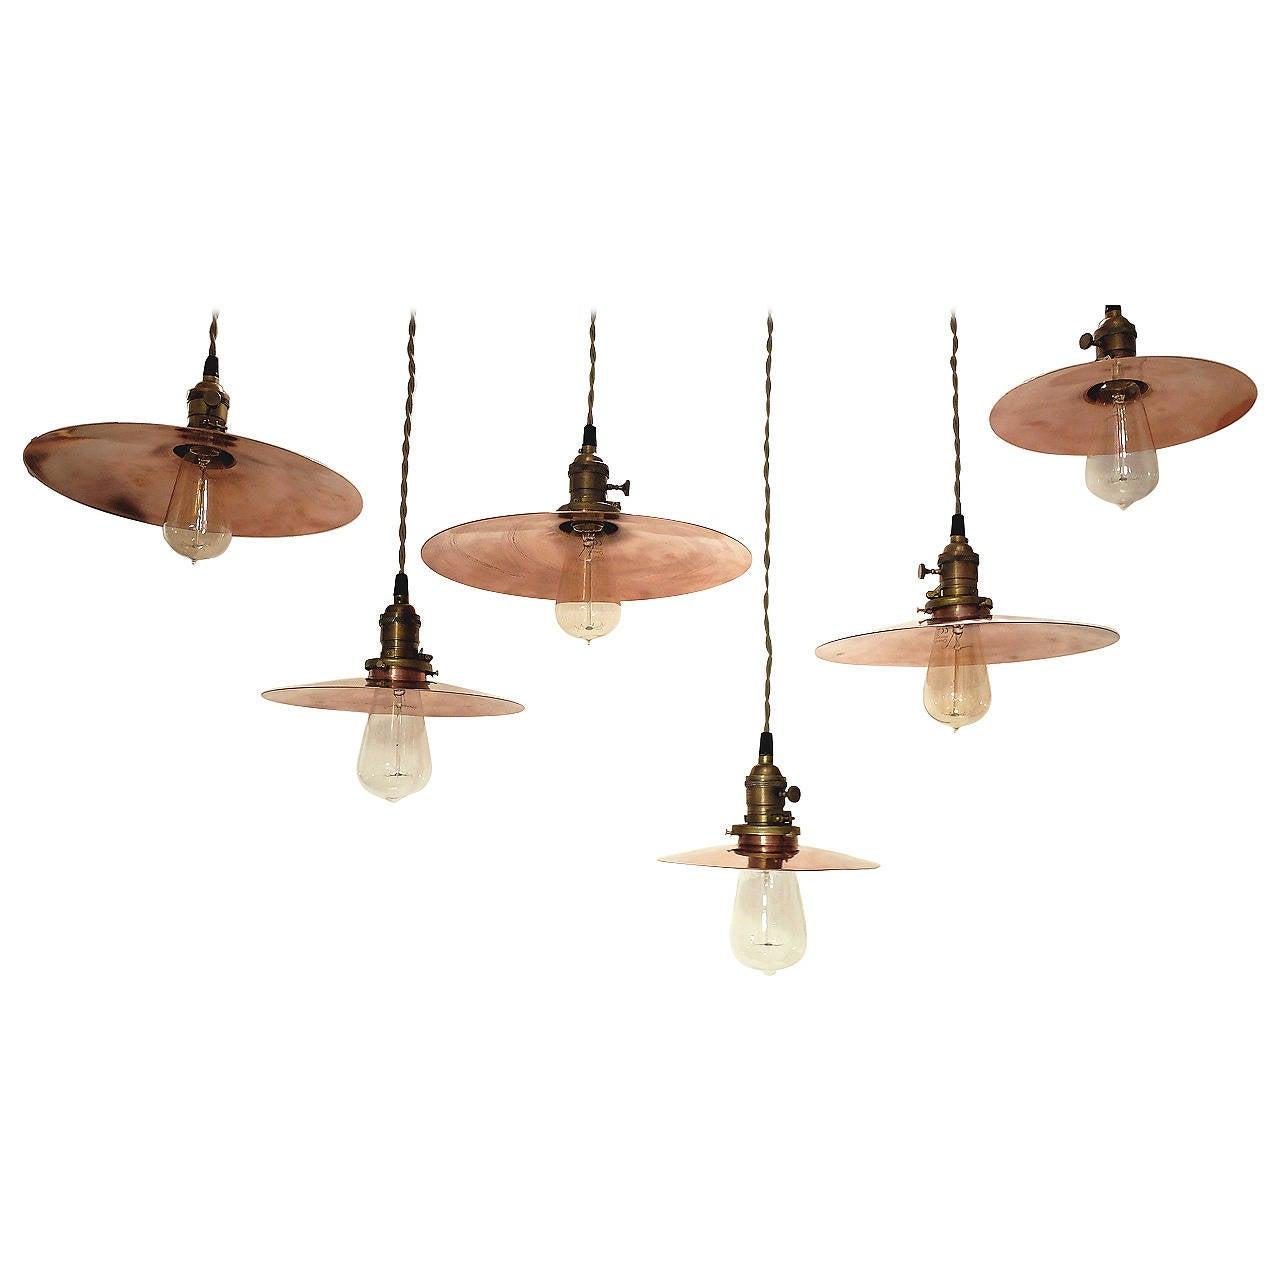 Set of copper swinging lamps, 1920s